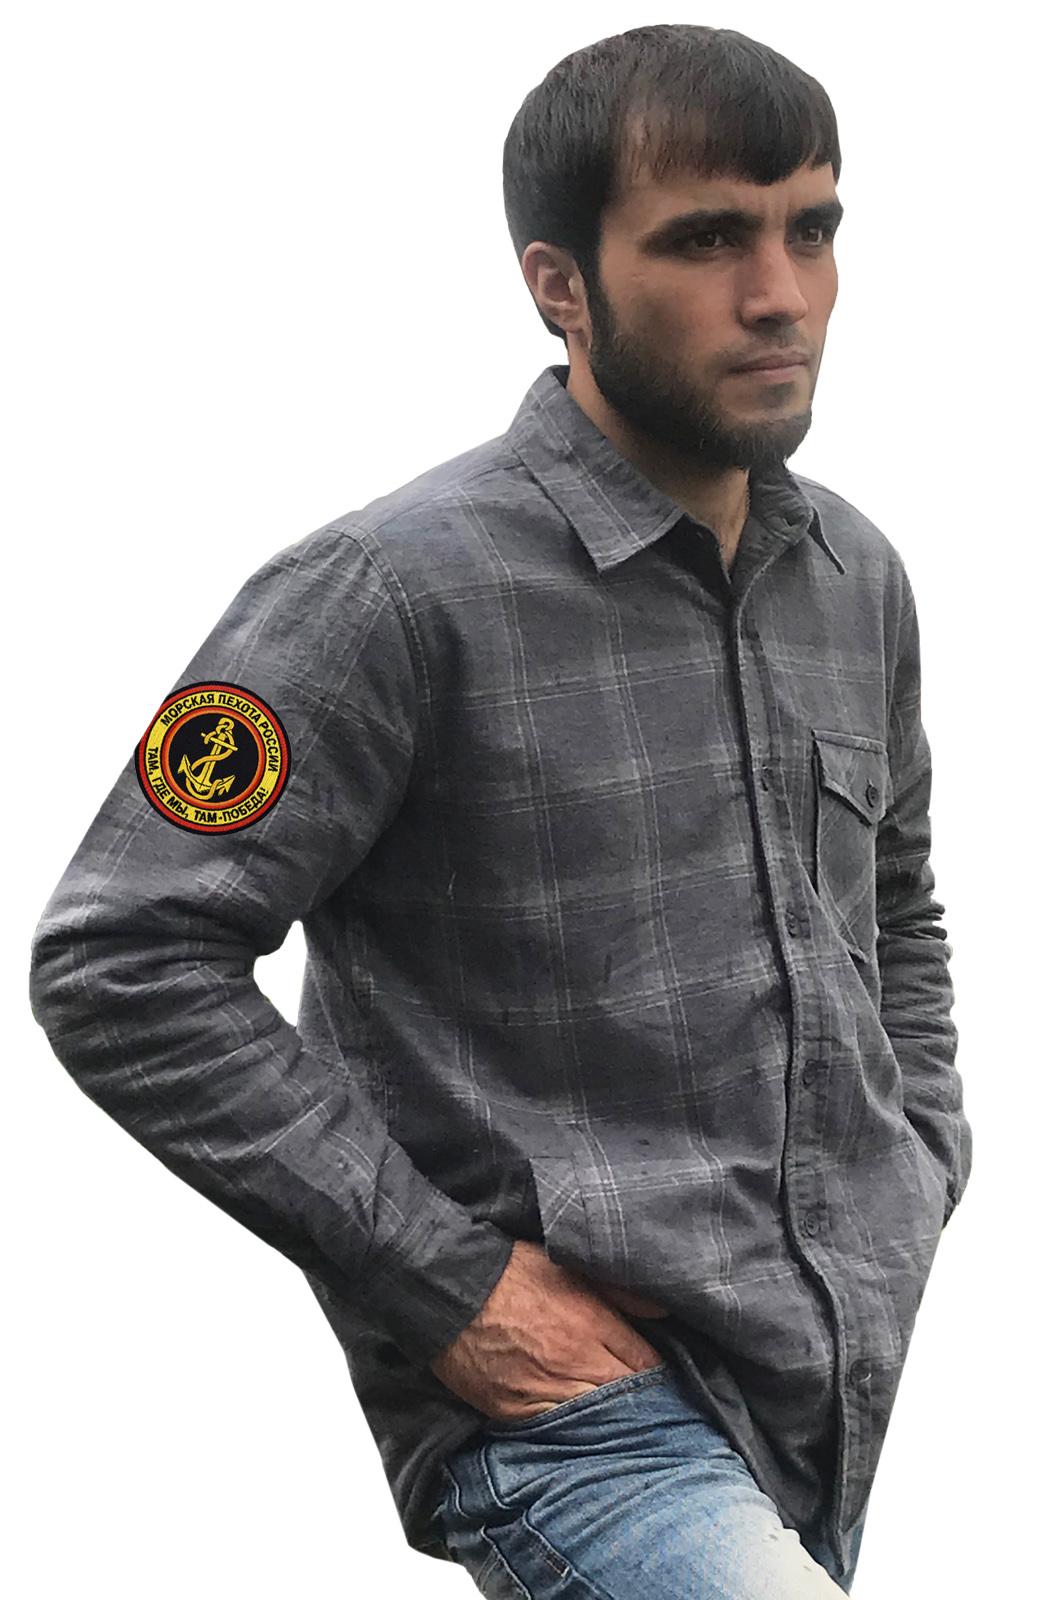 Клетчатая рубашка Морская пехота